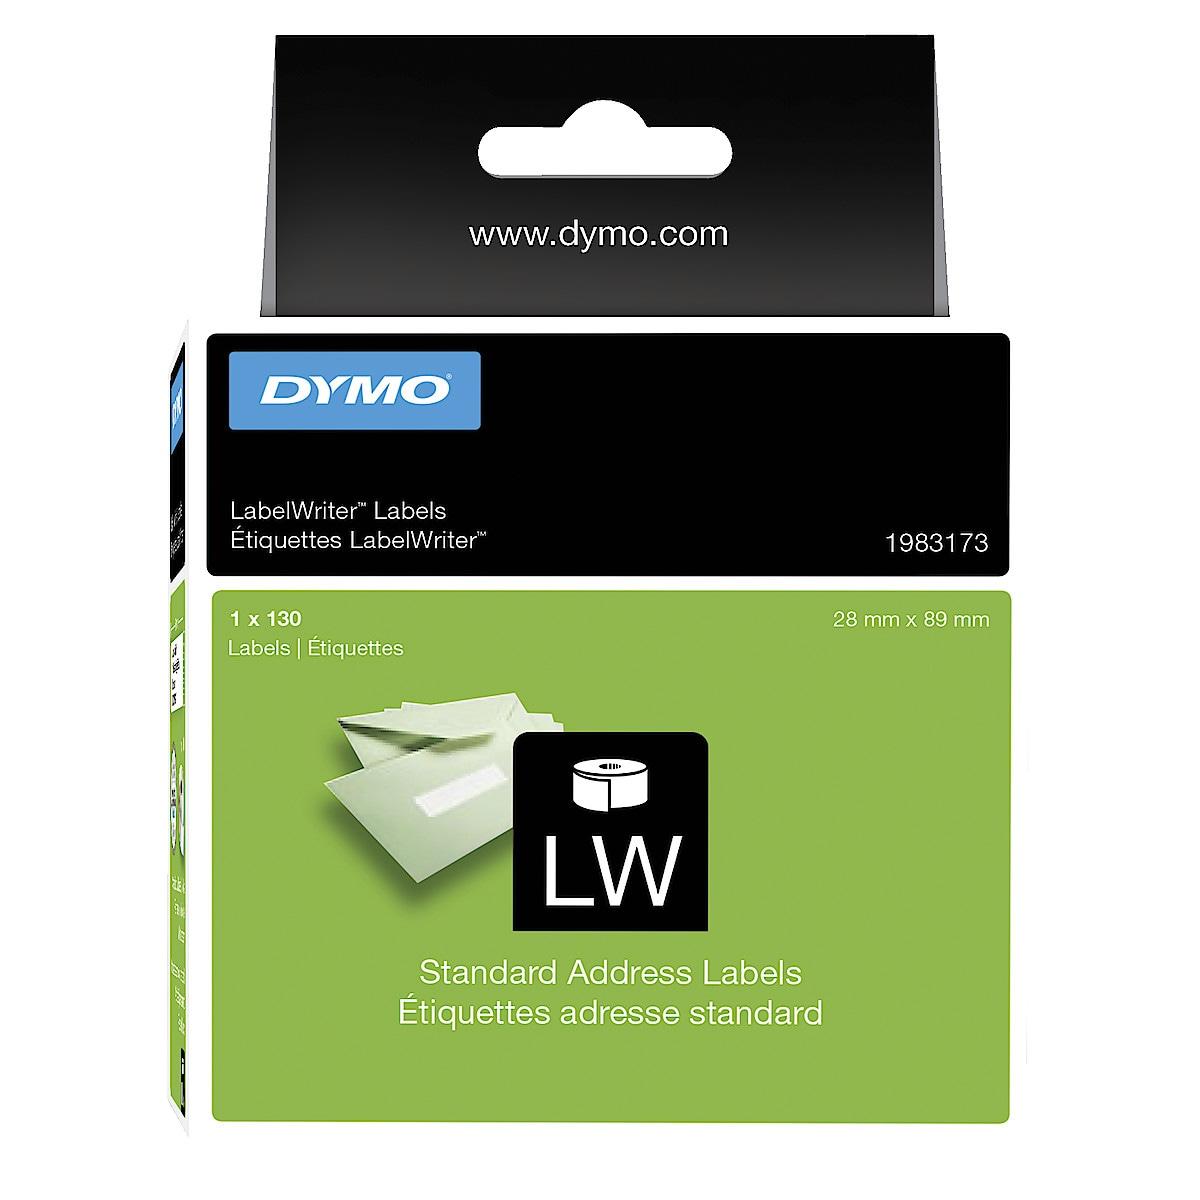 Dymo LabelWriter adresseetiketter